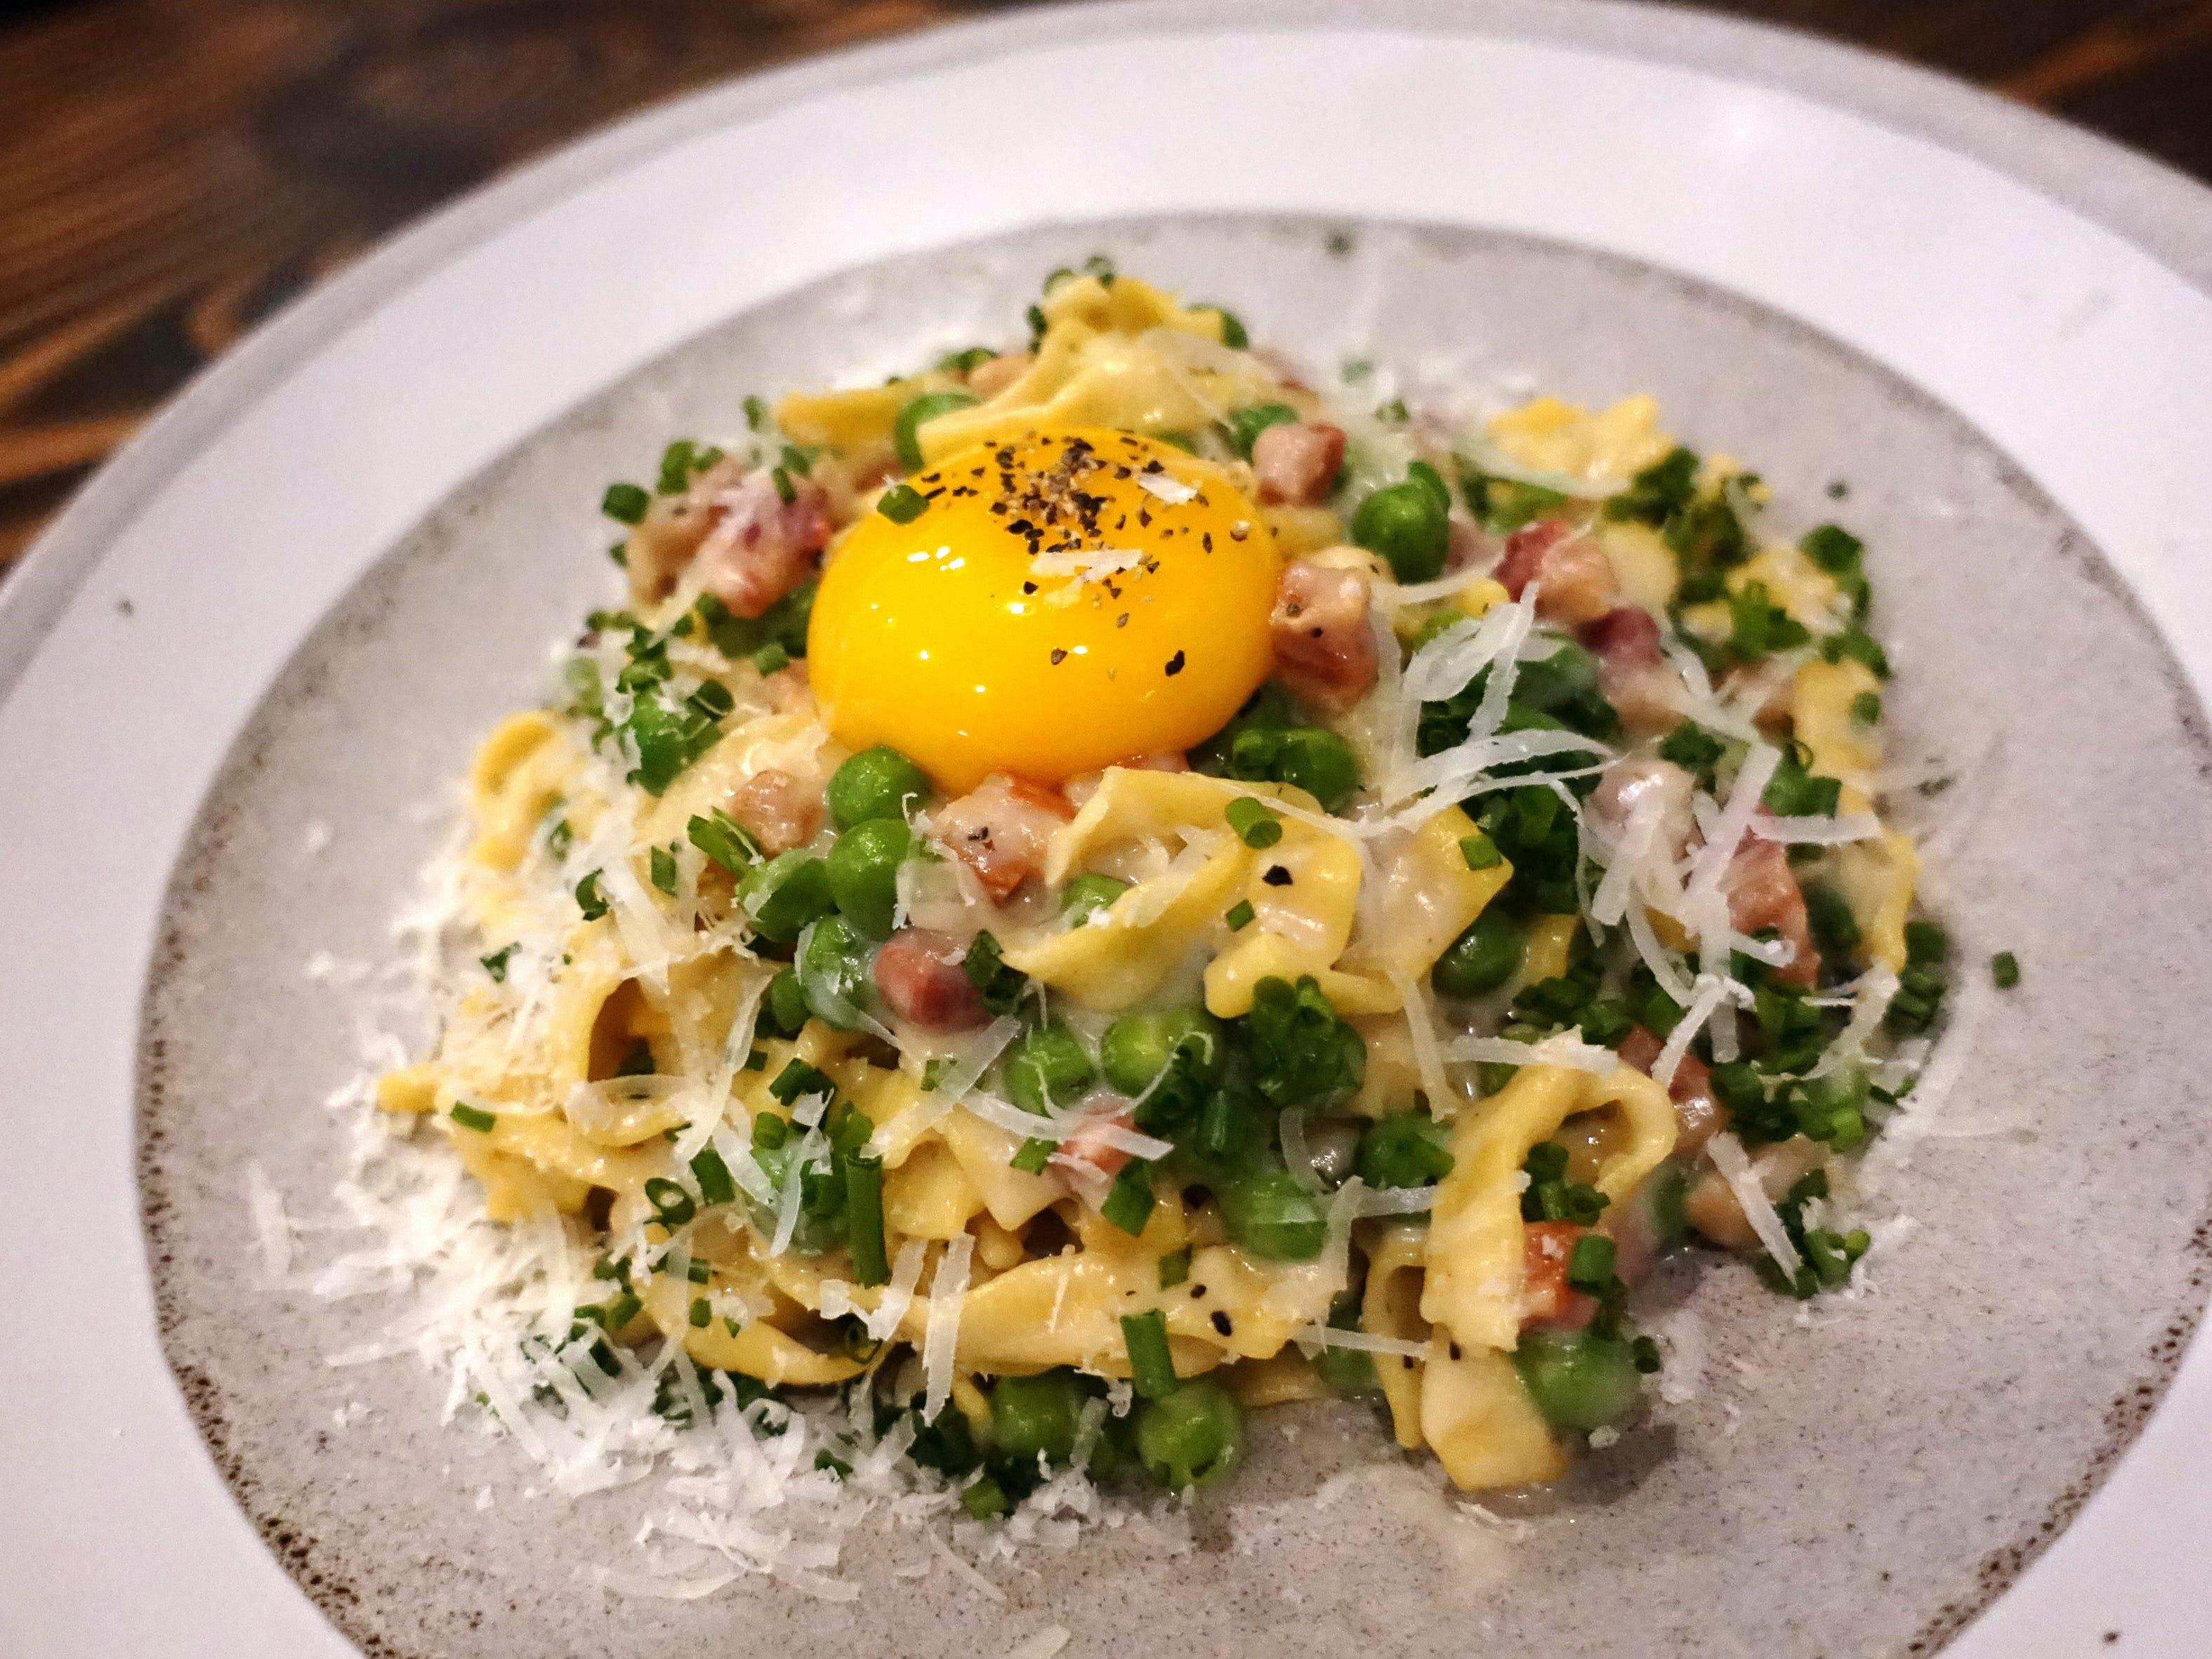 Pasta carbonara with egg yolk, pancetta, pecorino, pepper and peas at Hidden Kitchen in Phoenix.